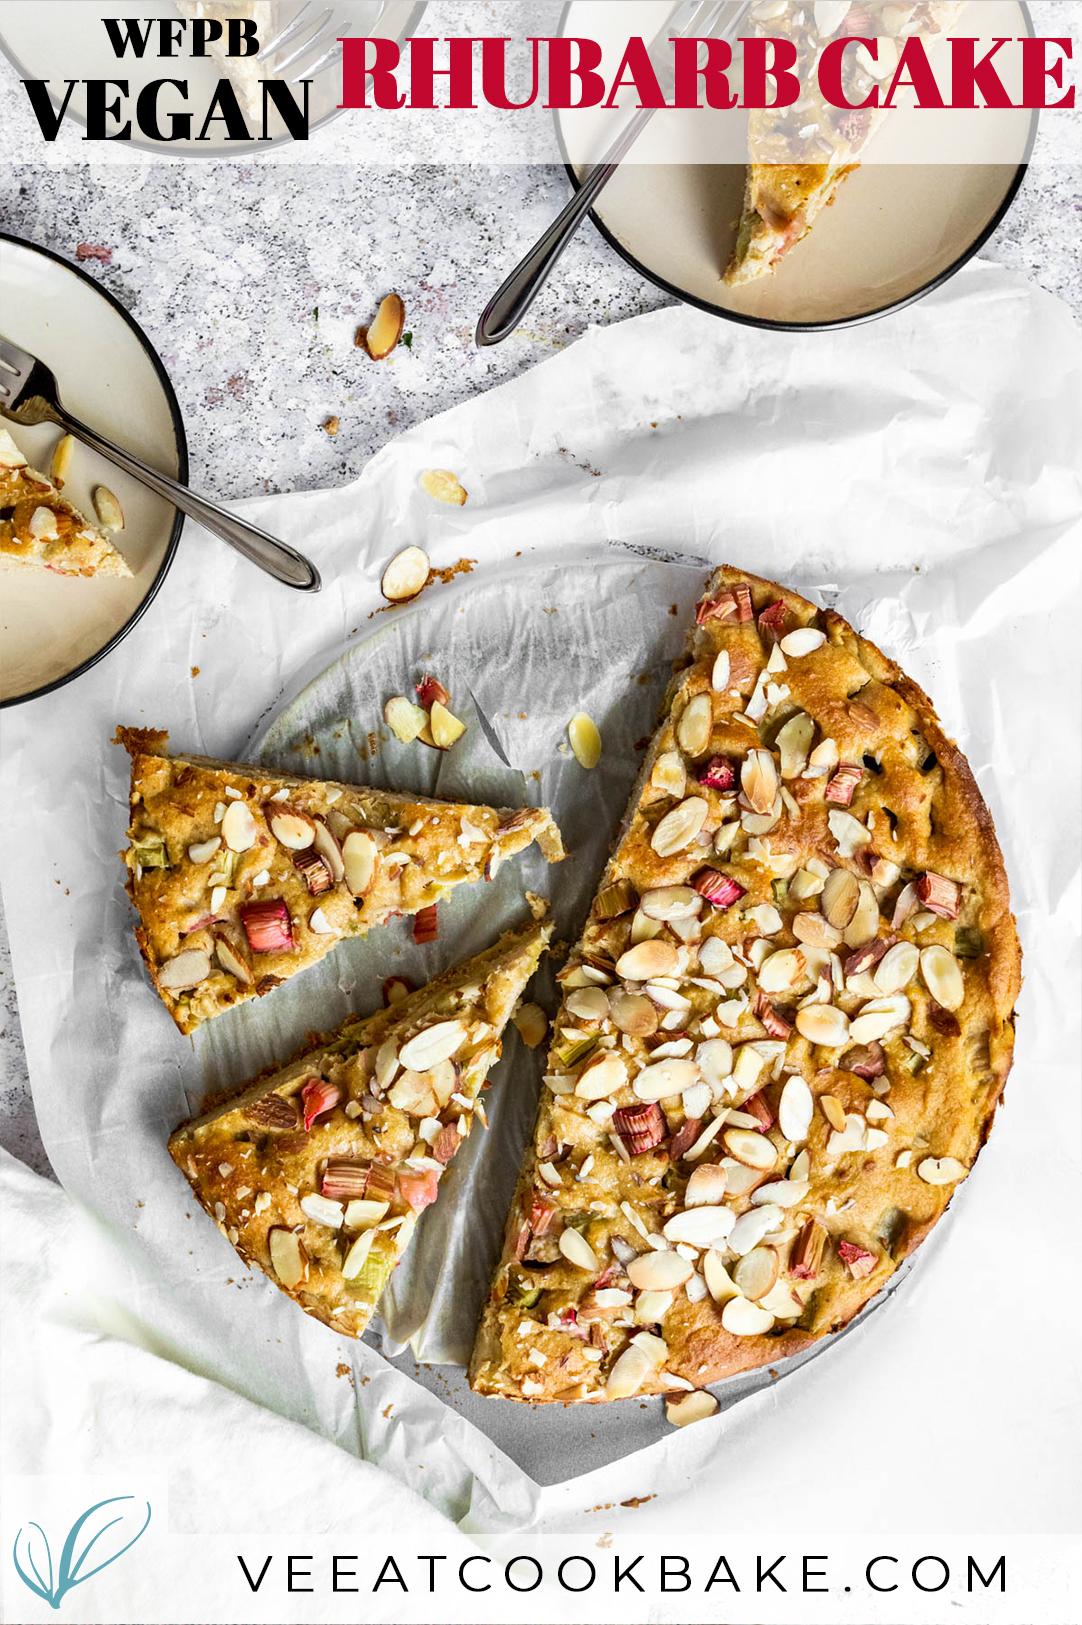 Vegan Rhubarb Cake Photography with text